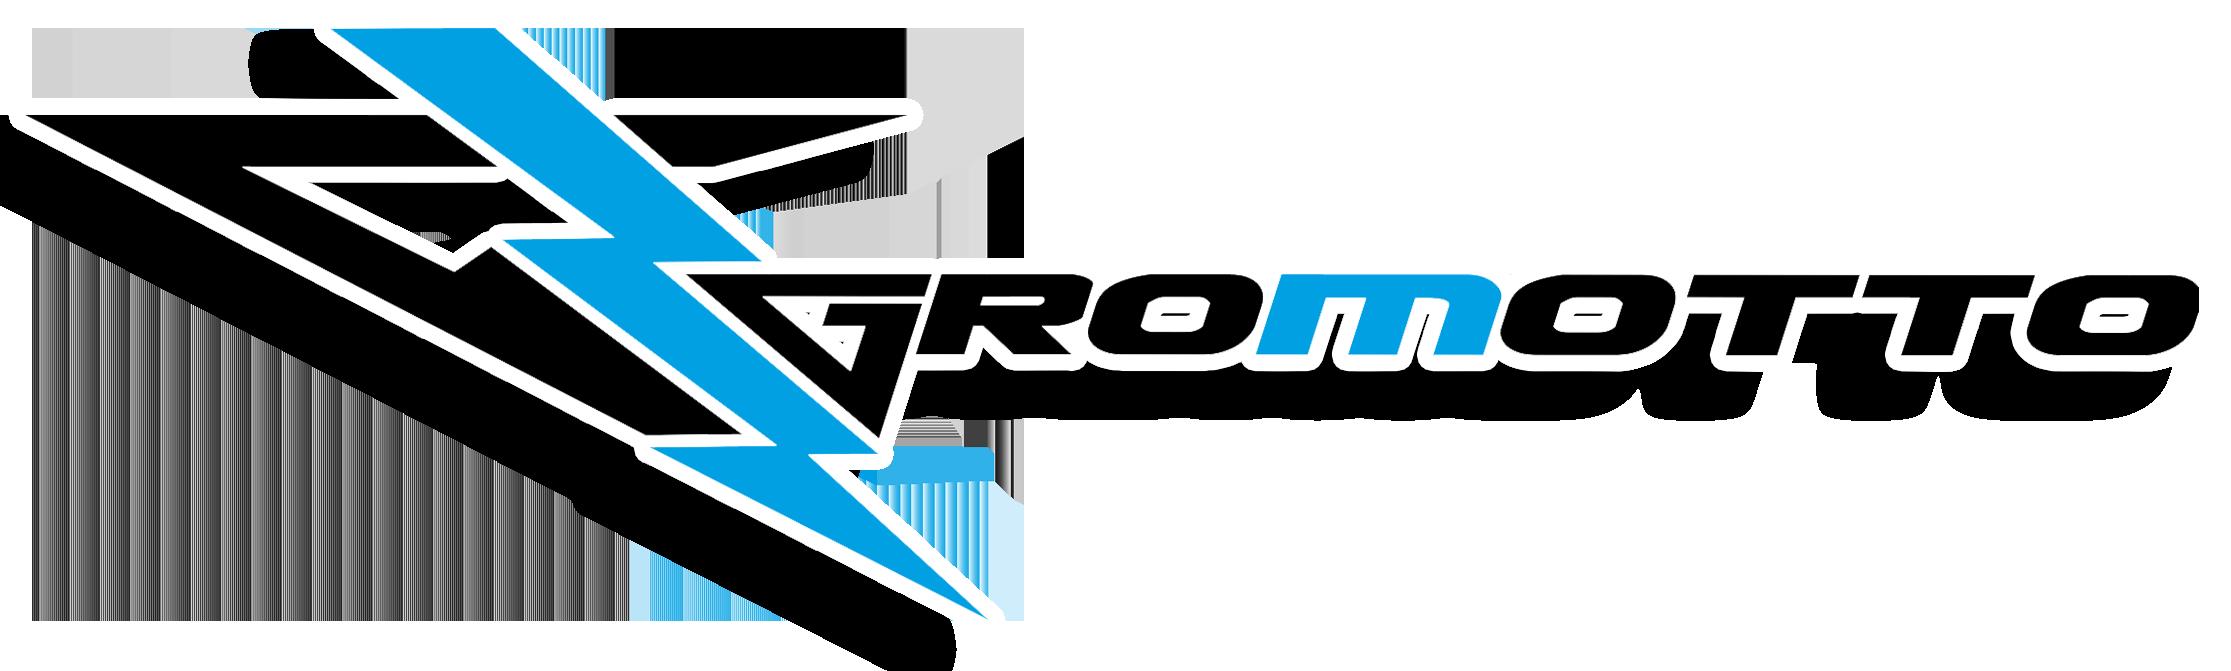 Gromotto | Blog